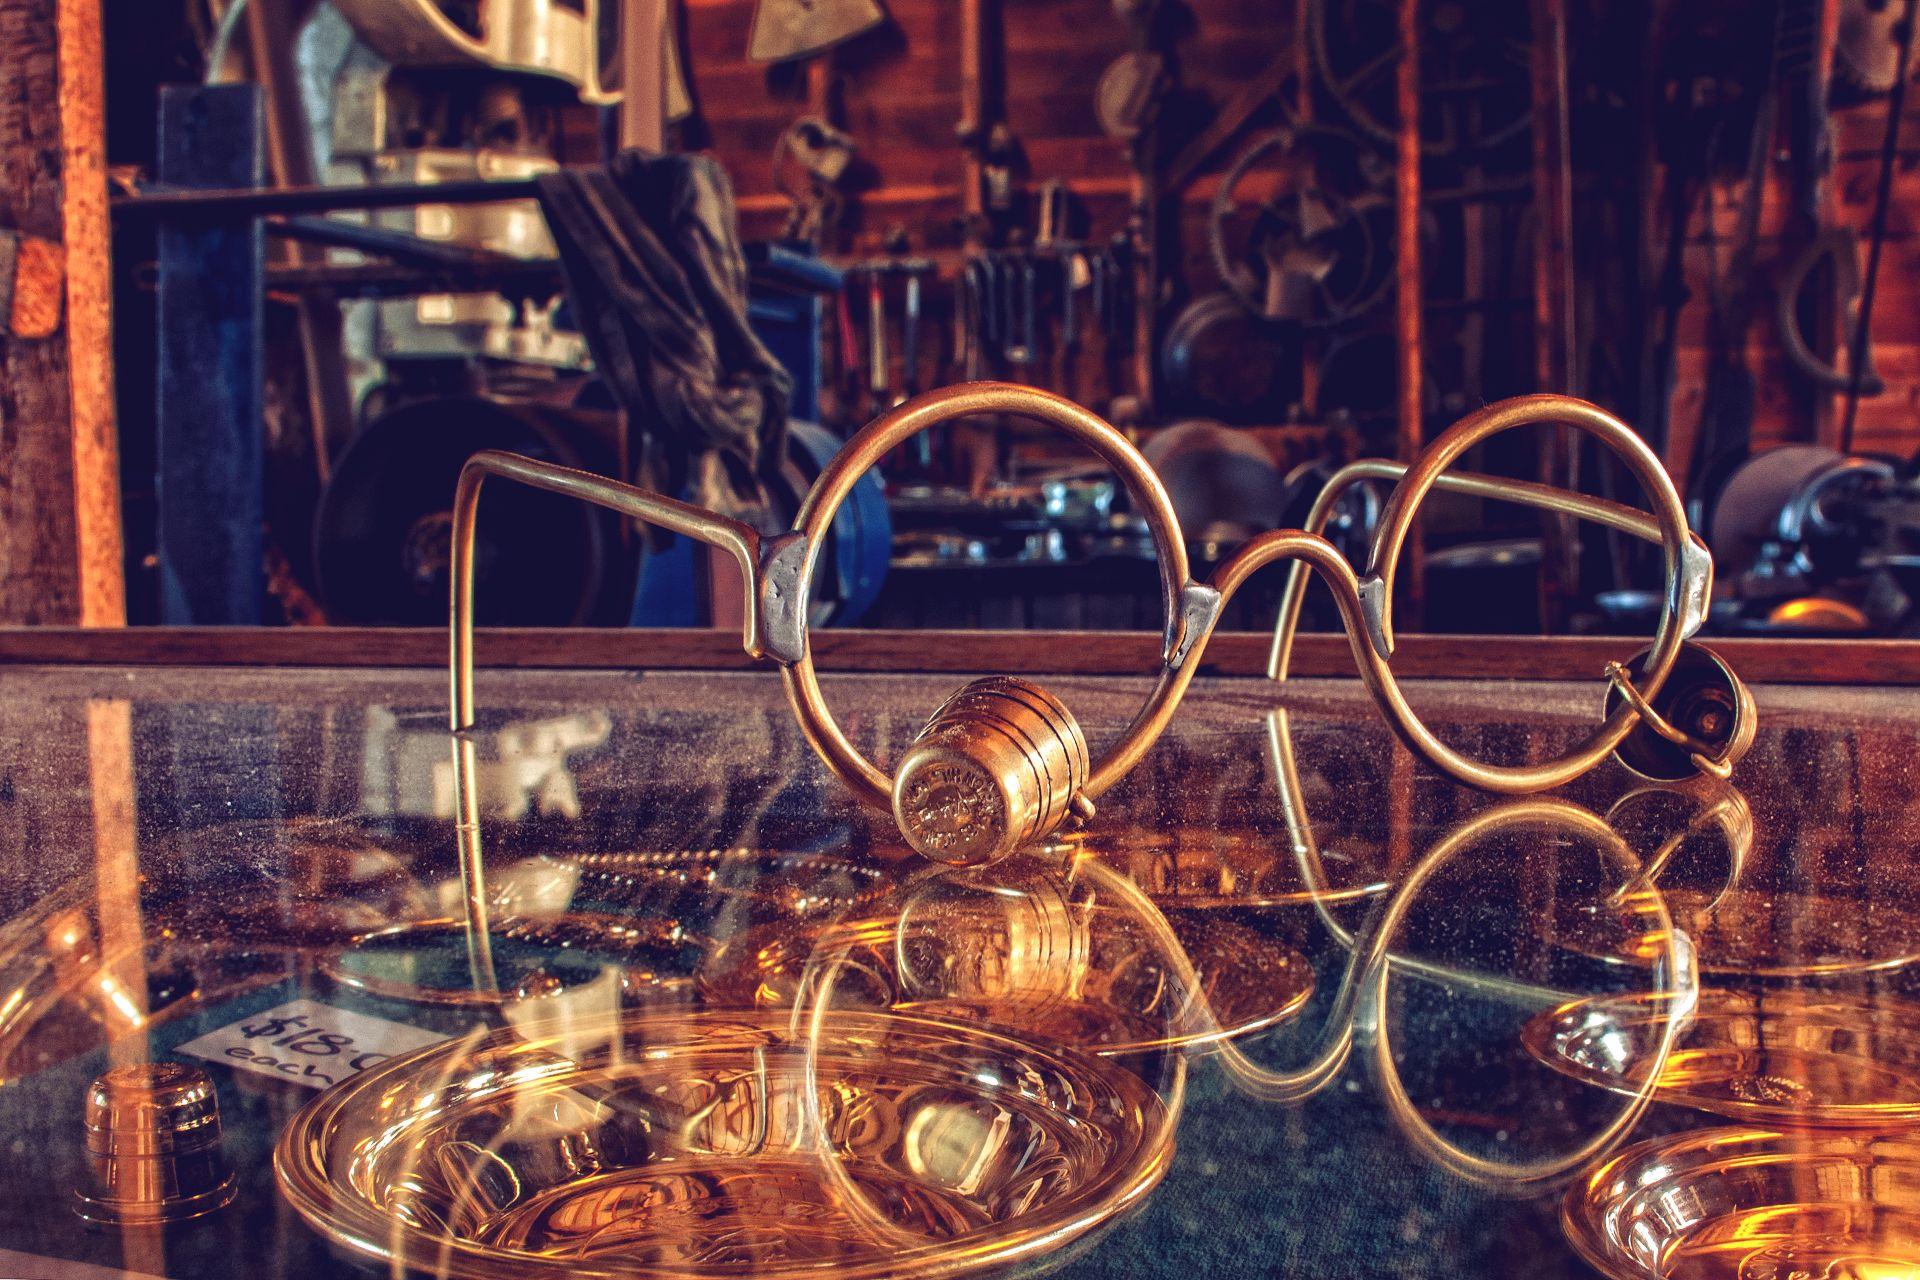 Sociedade Baiana de Óptica e Optometria